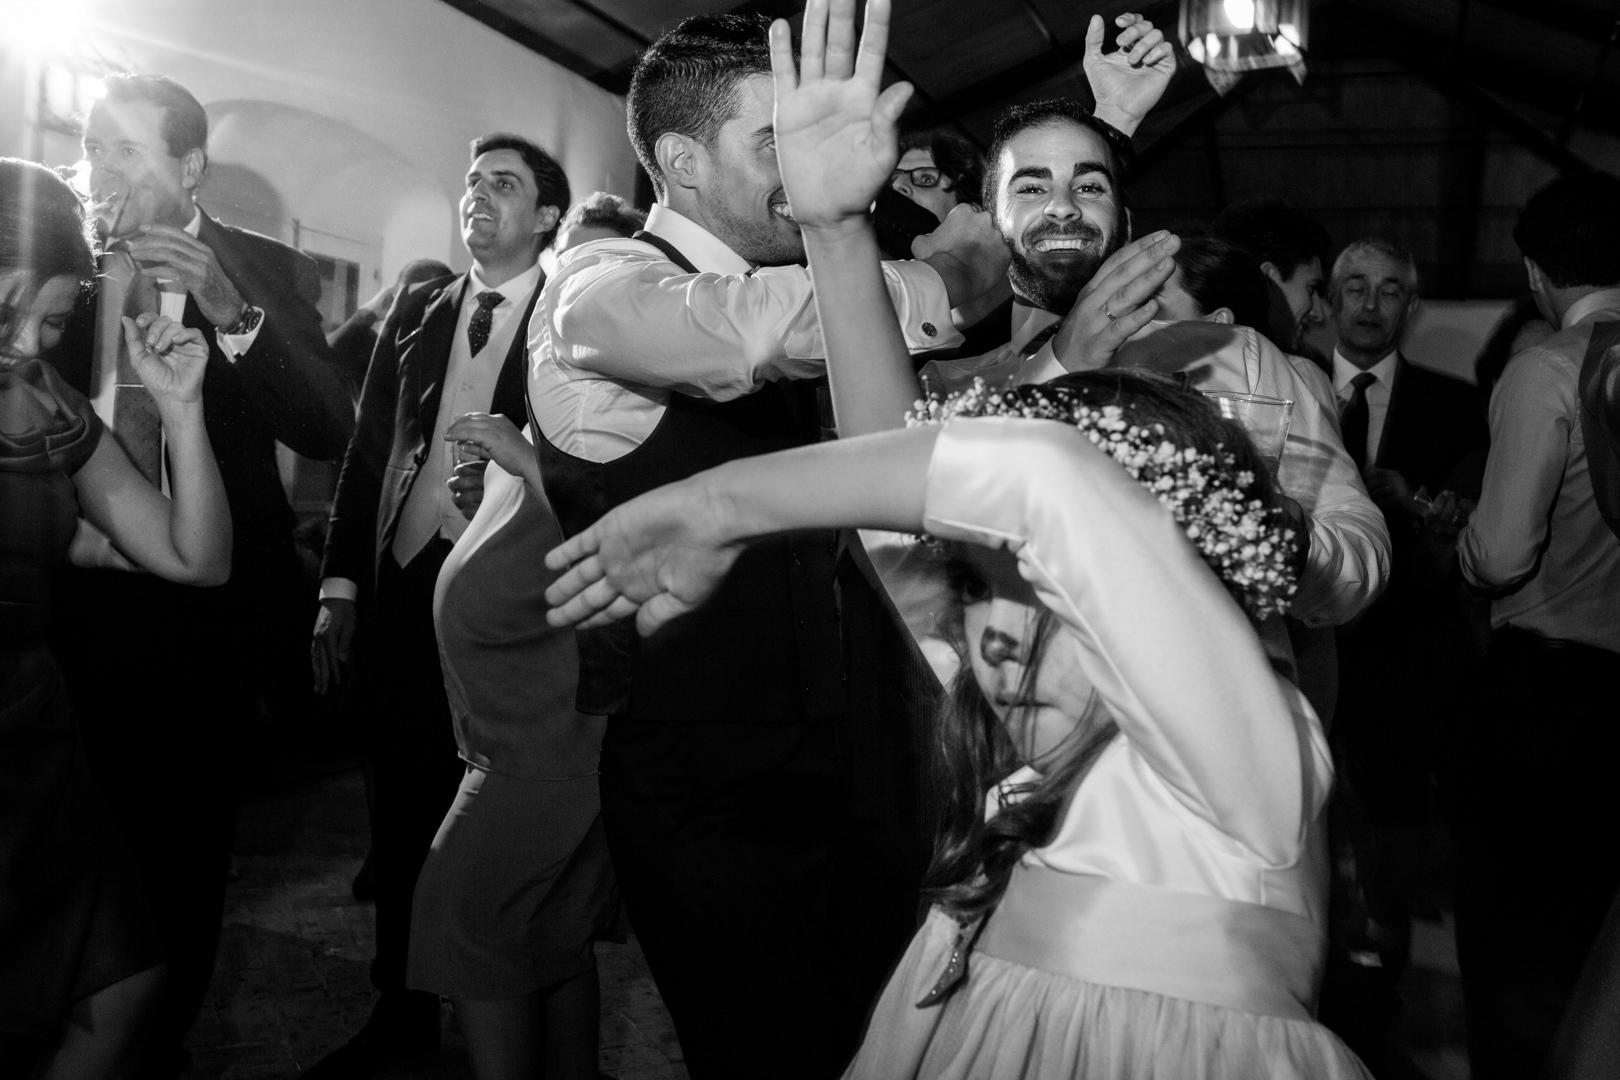 Boda-sevilla-Wedding-engagement-Rafael-Torres-fotografo-bodas-sevilla-madrid-barcelona-wedding-photographer--87.jpg